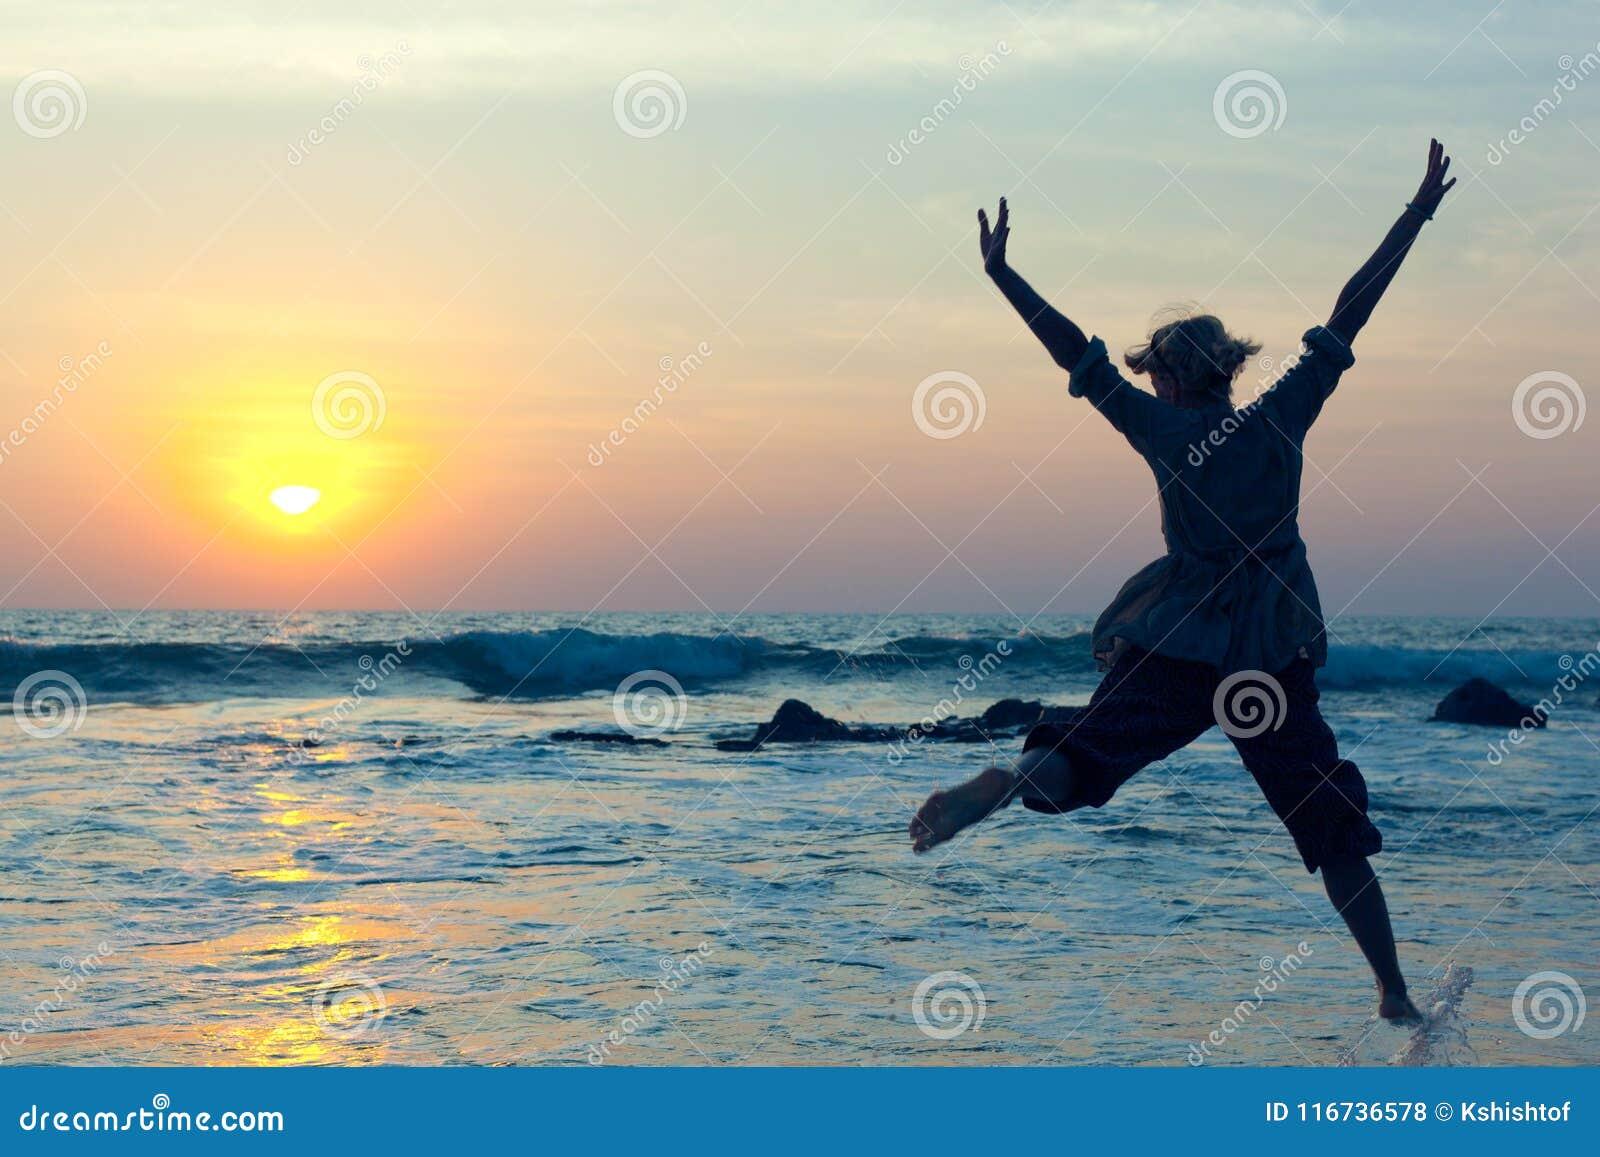 woman jumping joy stock photos royalty free stock images